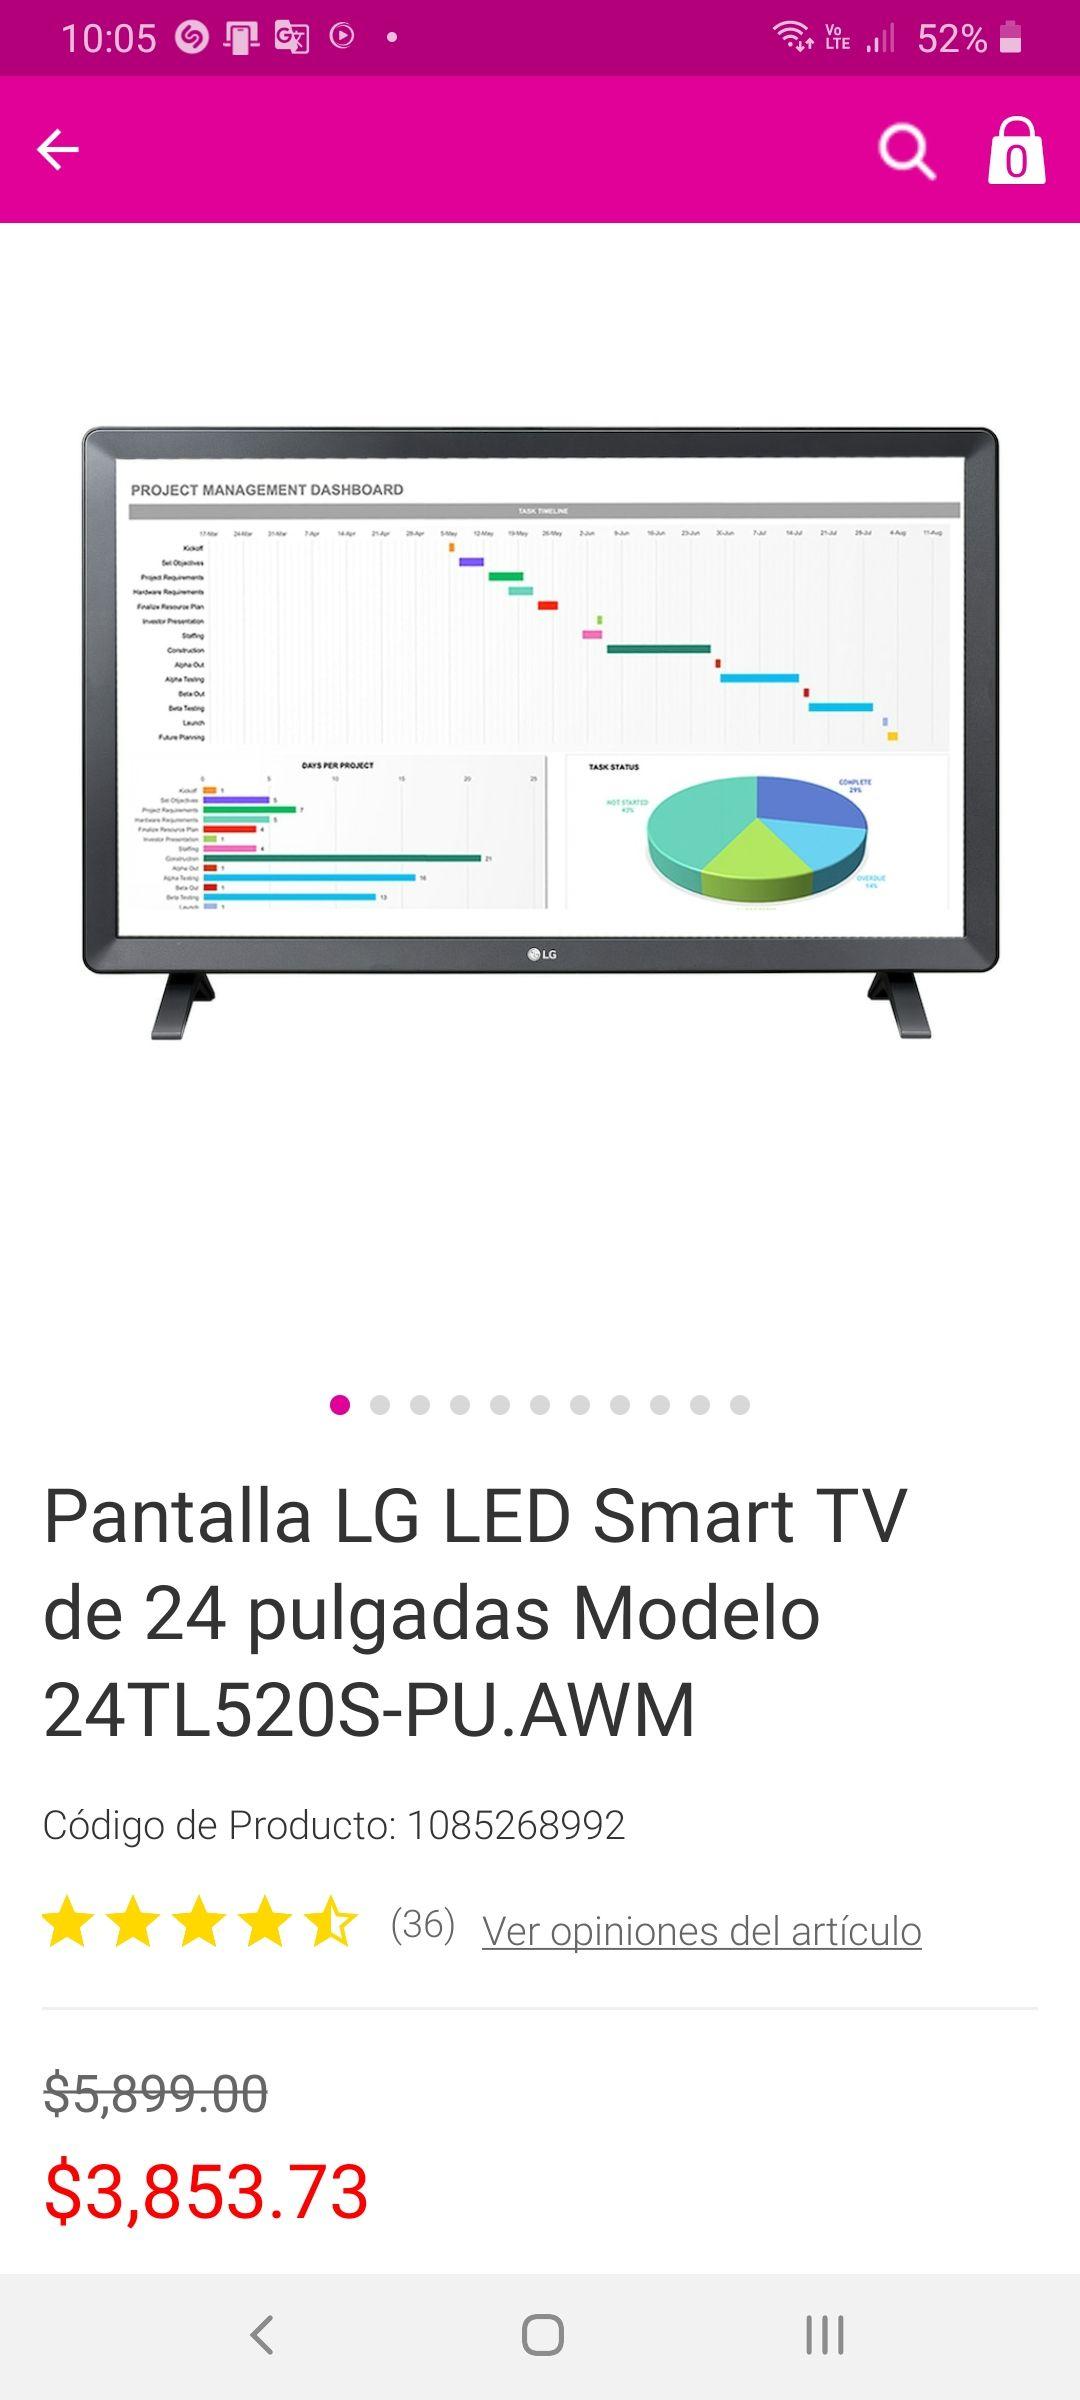 Liverpool: Pantalla LG led smart tv de 24 pulgadas